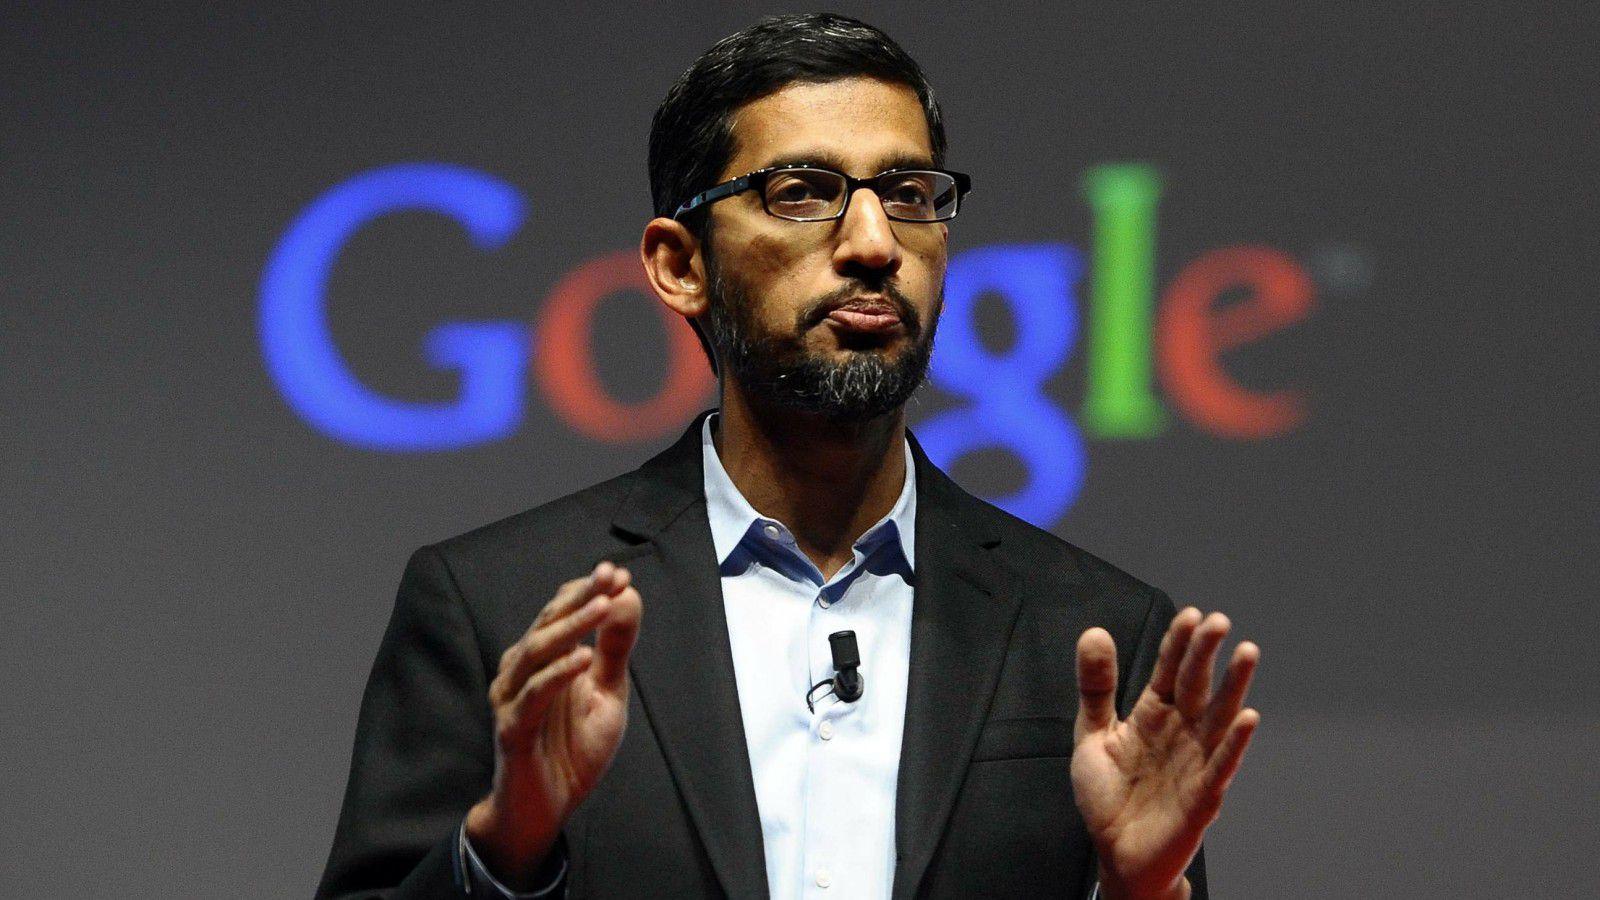 CEO Google поддержал Тима Кука в борьбе против ФБР